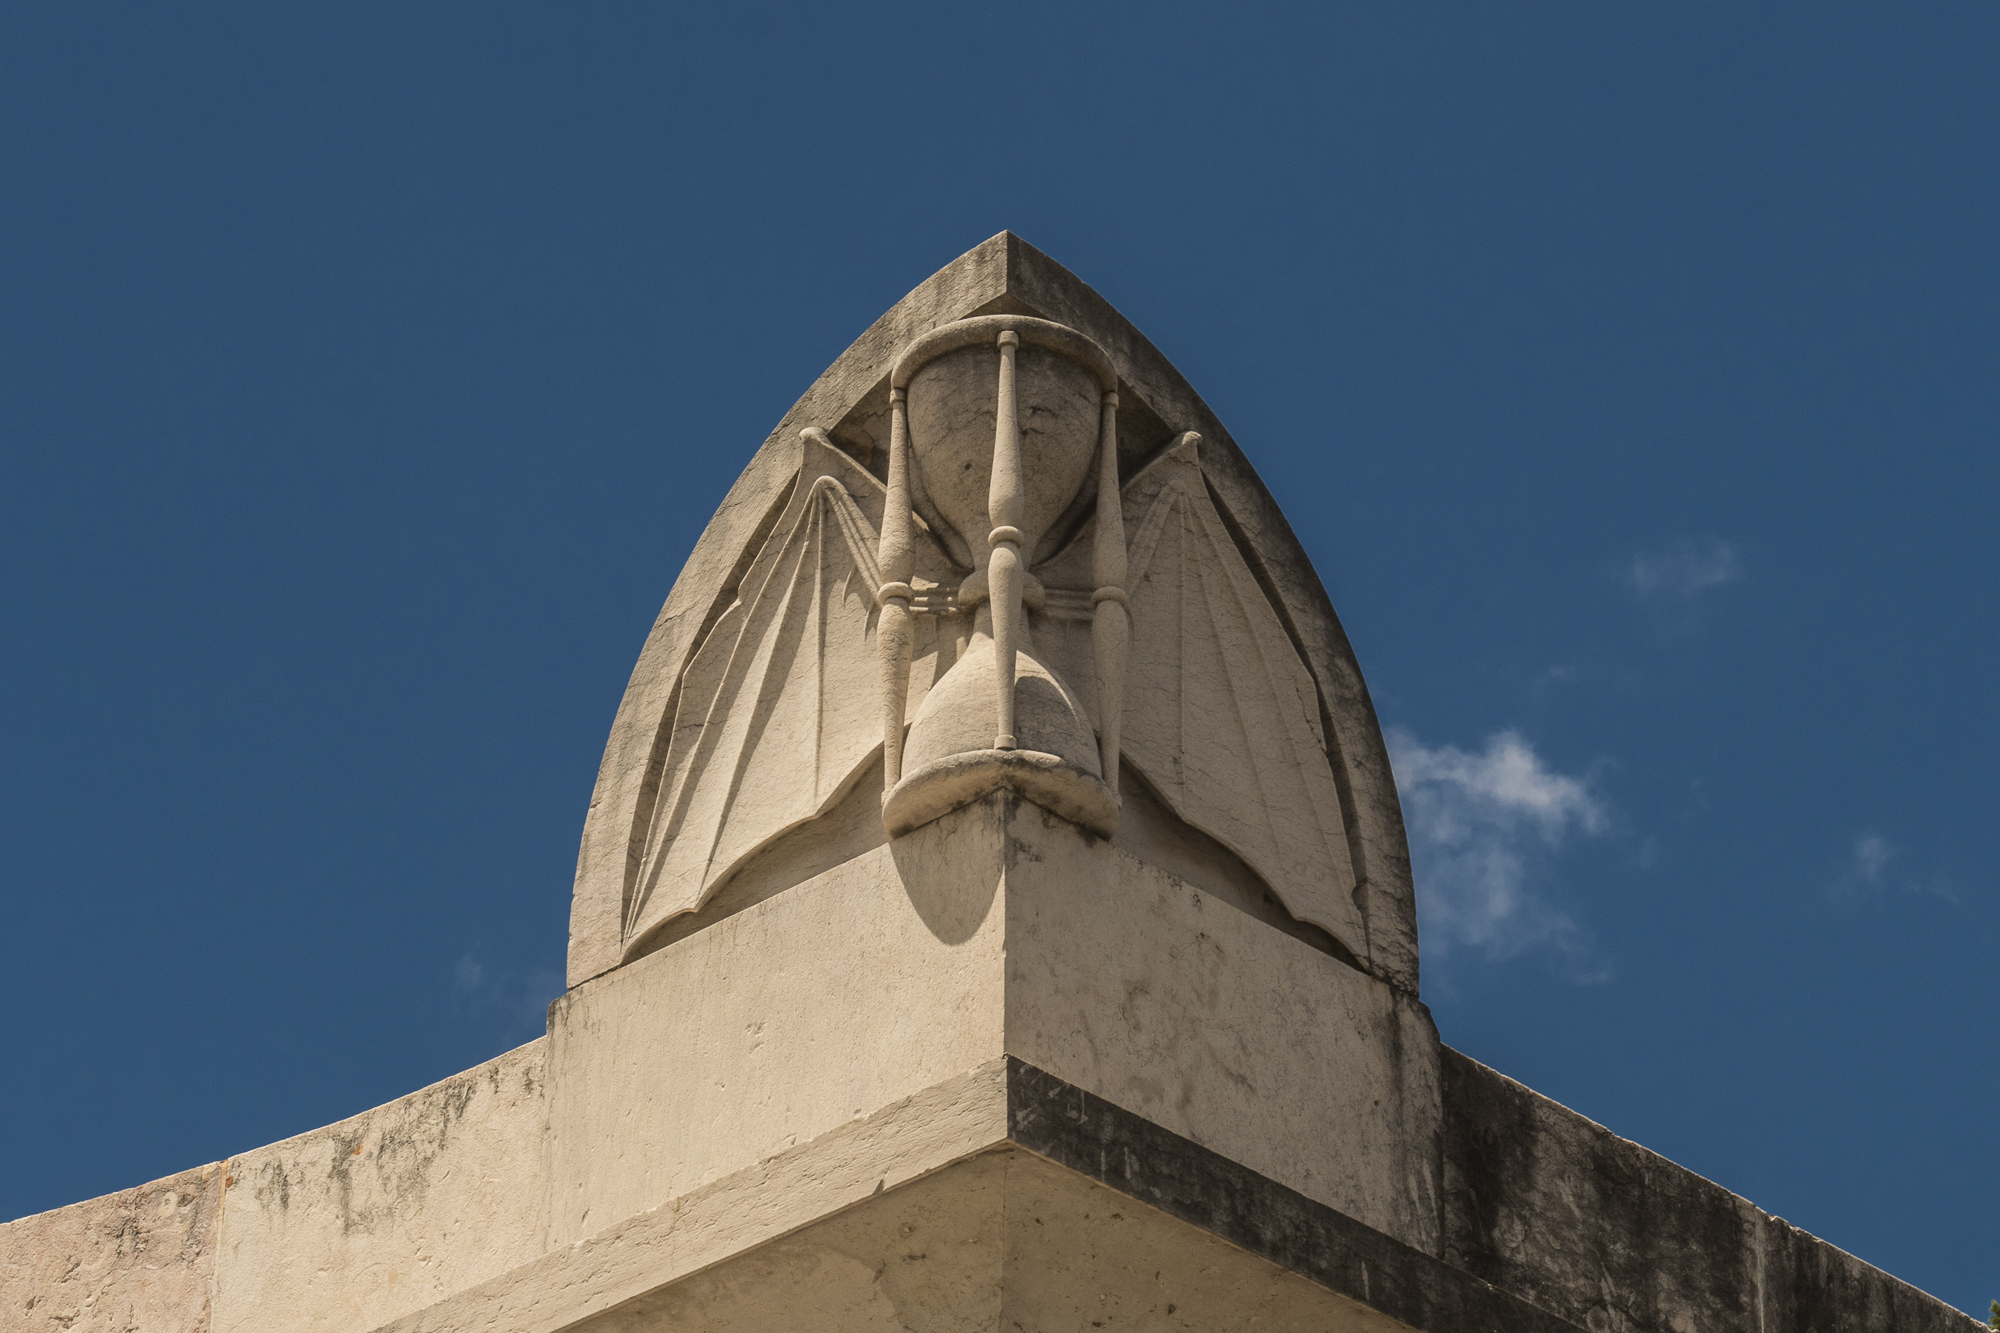 Prazeres Cemetery  PHOTOGRAPHY: ALEXANDER J.E. BRADLEY •NIKON D500 • AF-S NIKKOR 24-70mm f/2.8G ED • 50mm • F/11 •1/500 •ISO 100